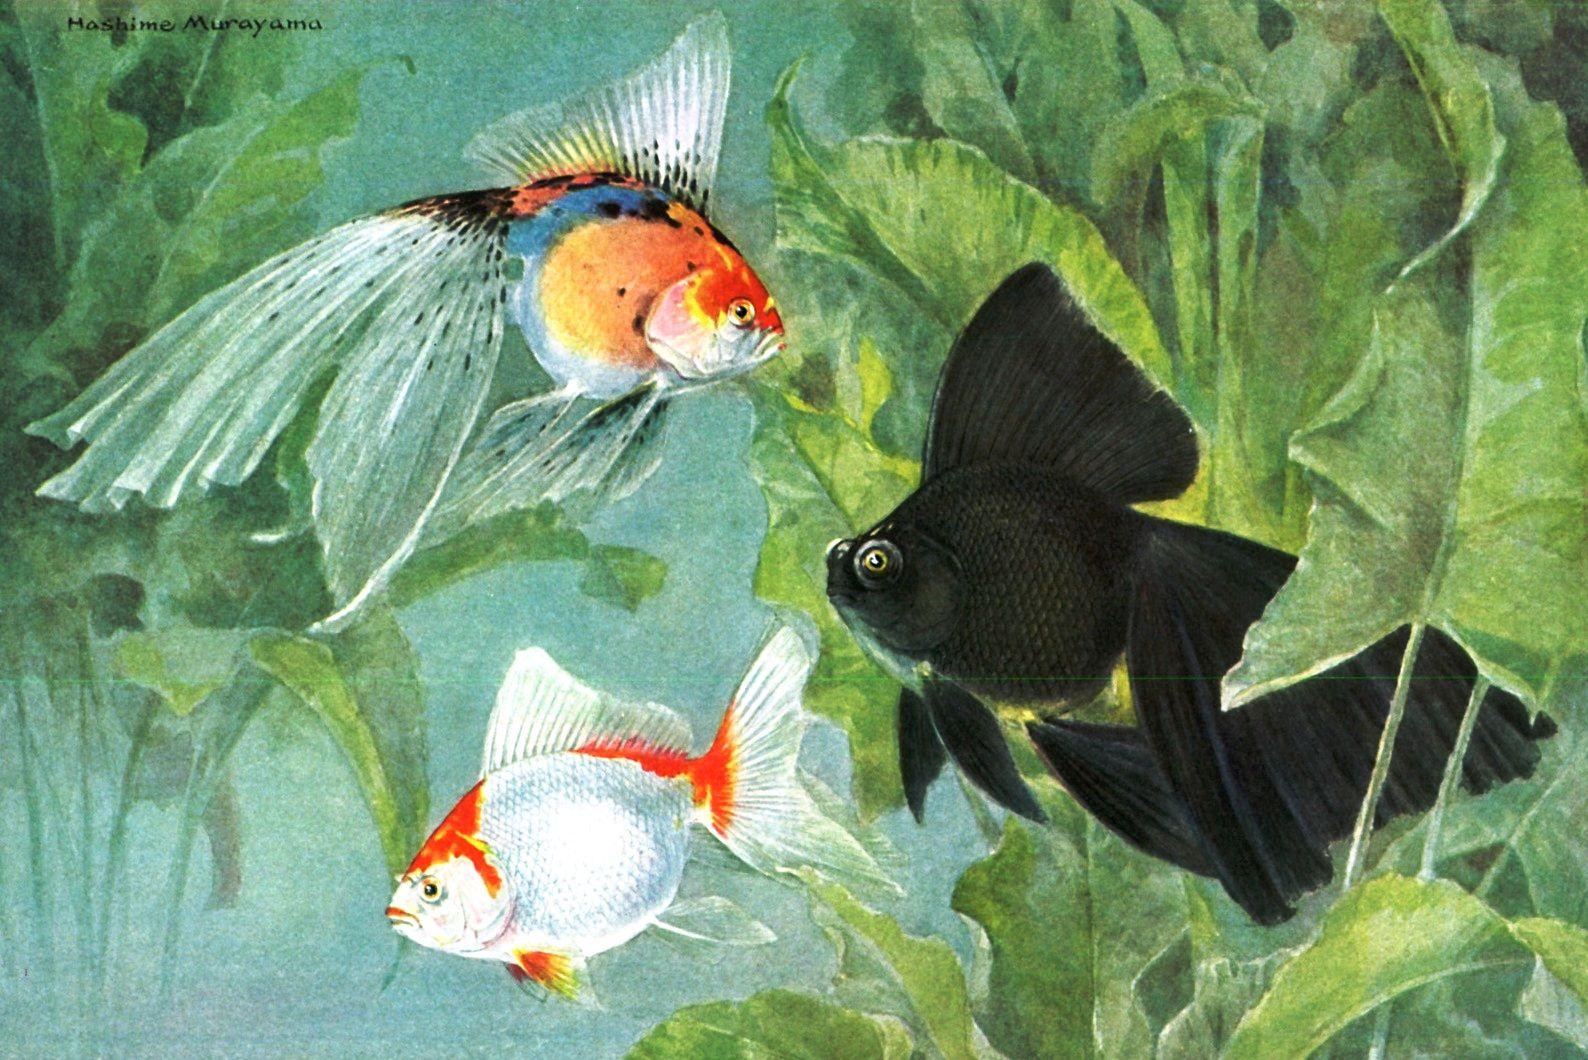 Pin by Taka Minami on Goldfish 金魚 Peixe Dourado 金鱼 Poisson rouge ...